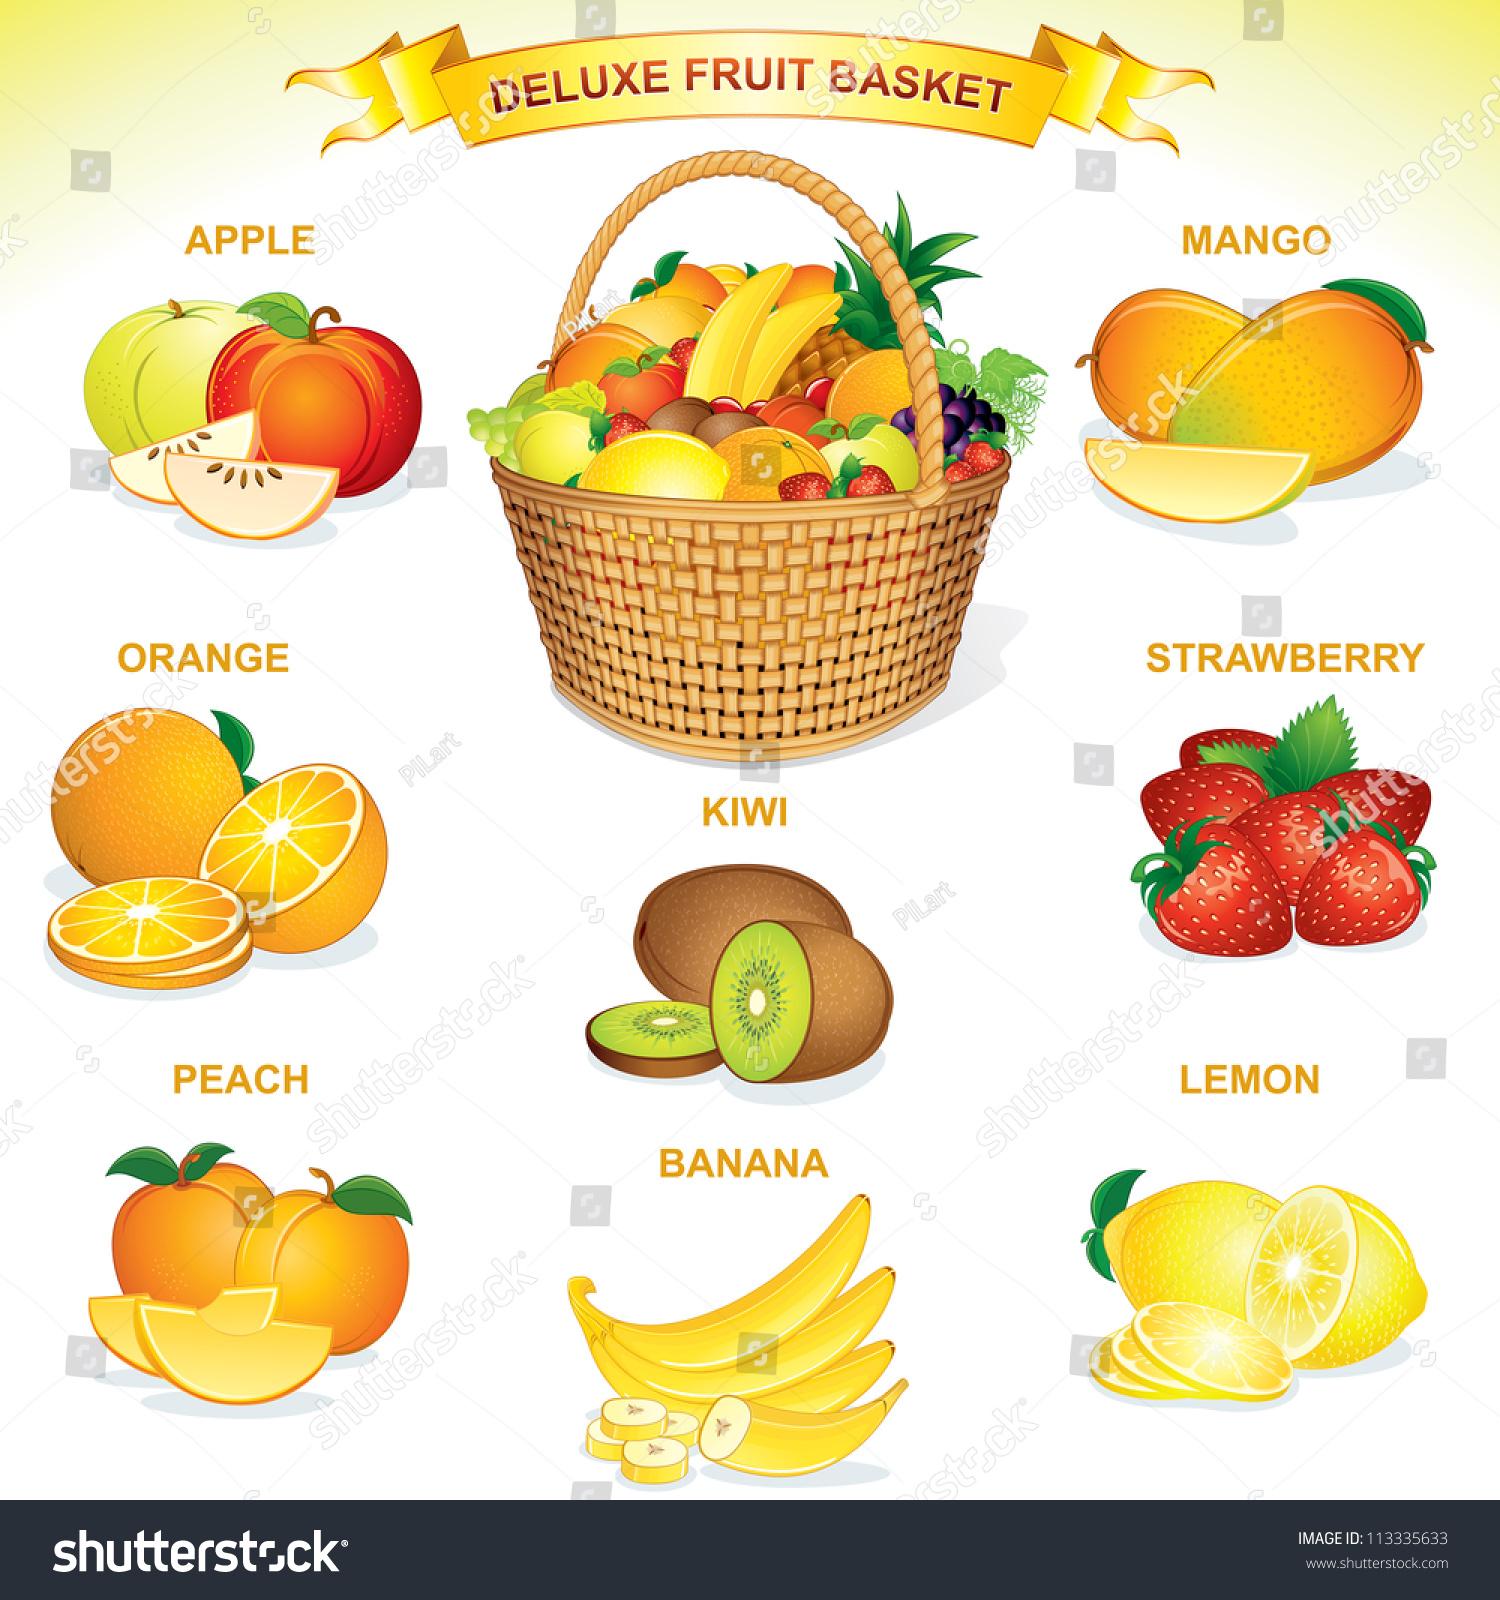 Deluxe Fruit Basket. Vector Illustration